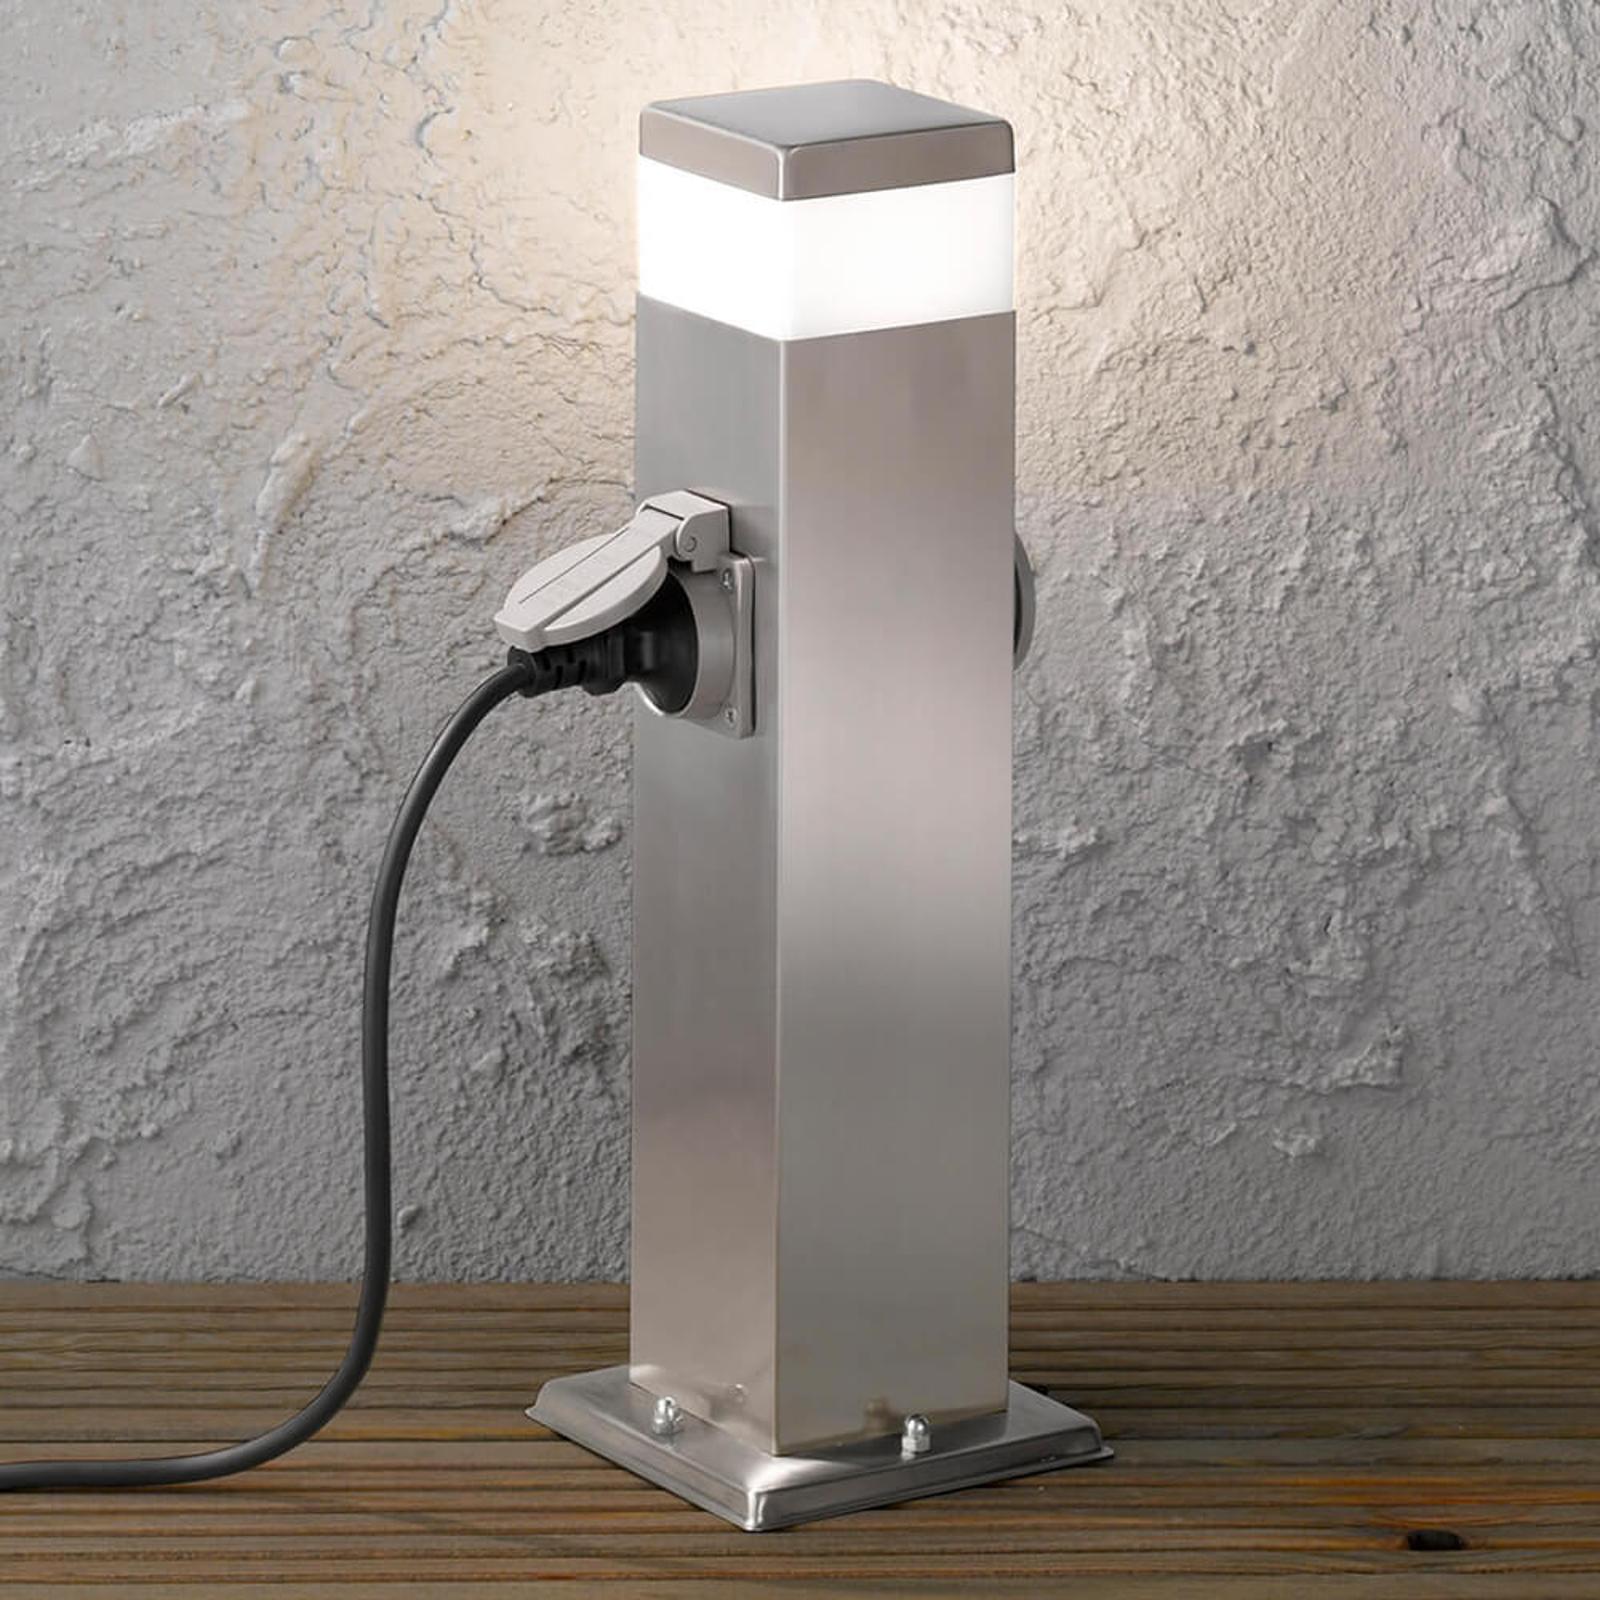 2er Steckdosensäule Tara mit LED-Beleuchtung kaufen